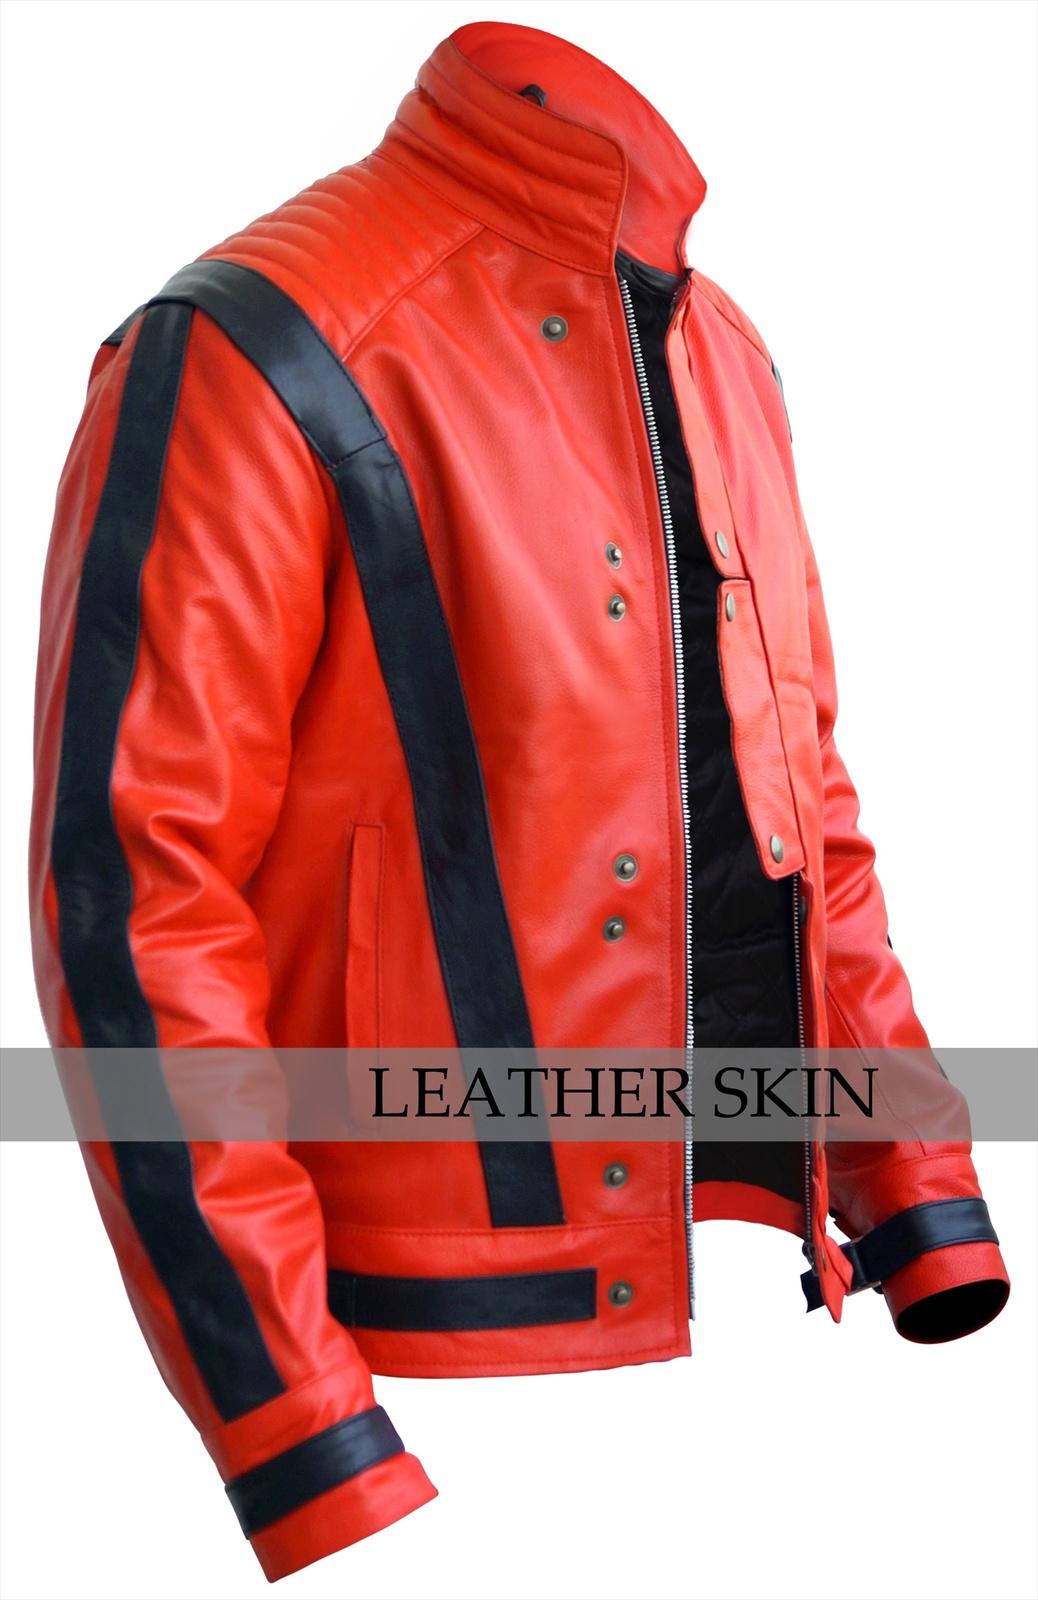 Michael jackson red leather jacket